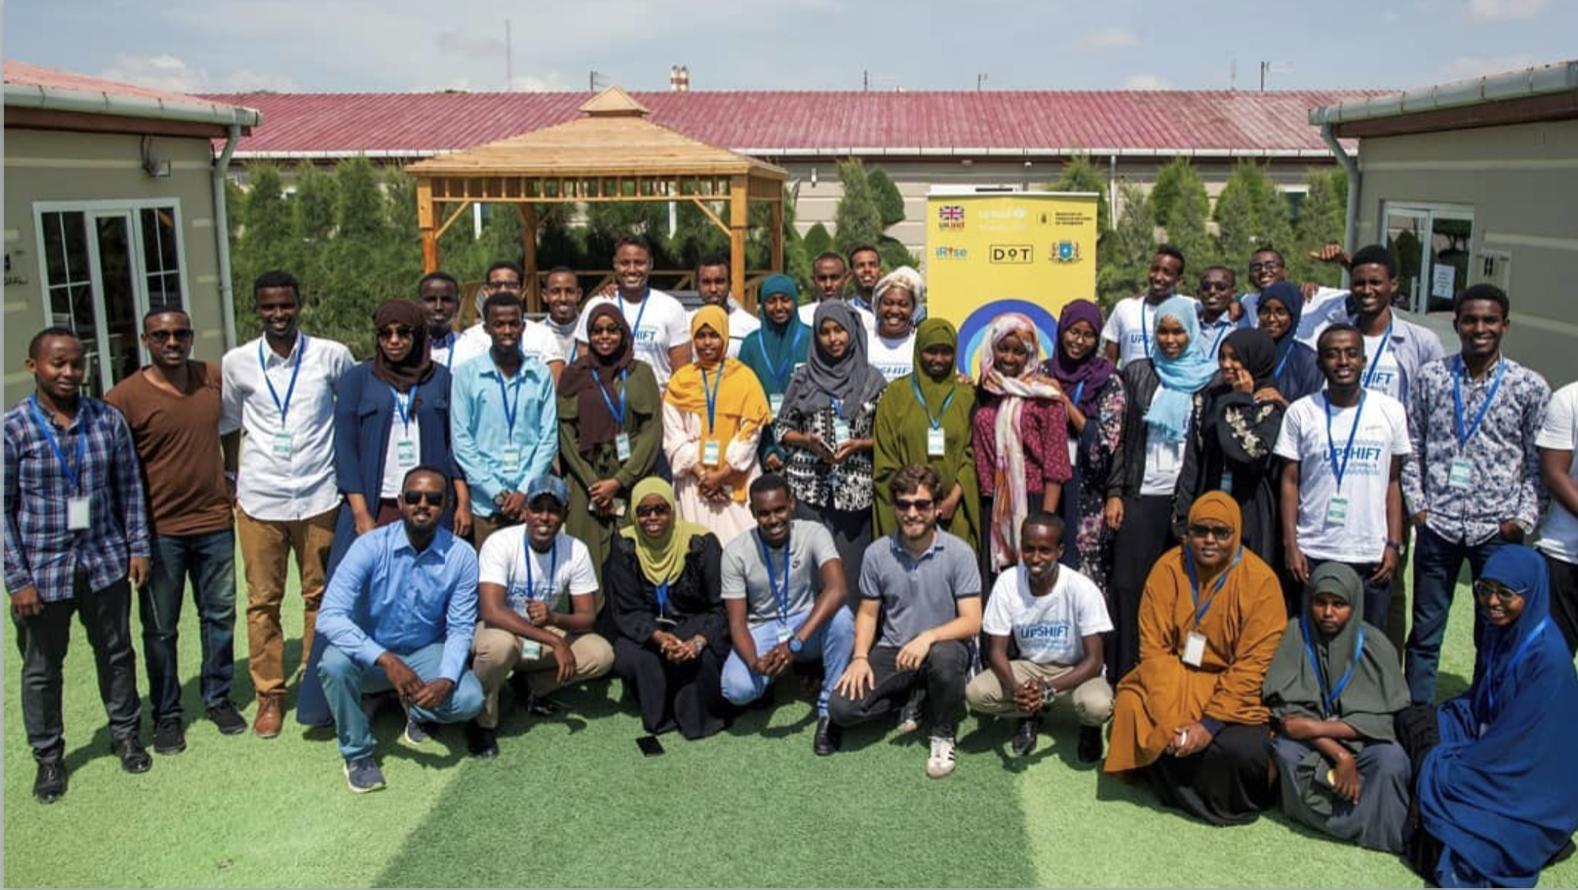 Mogadishu, Somalia, UNICEF, DOT, design, social innovation, africa, youth africa, social entrepreneurship, future, future thinking